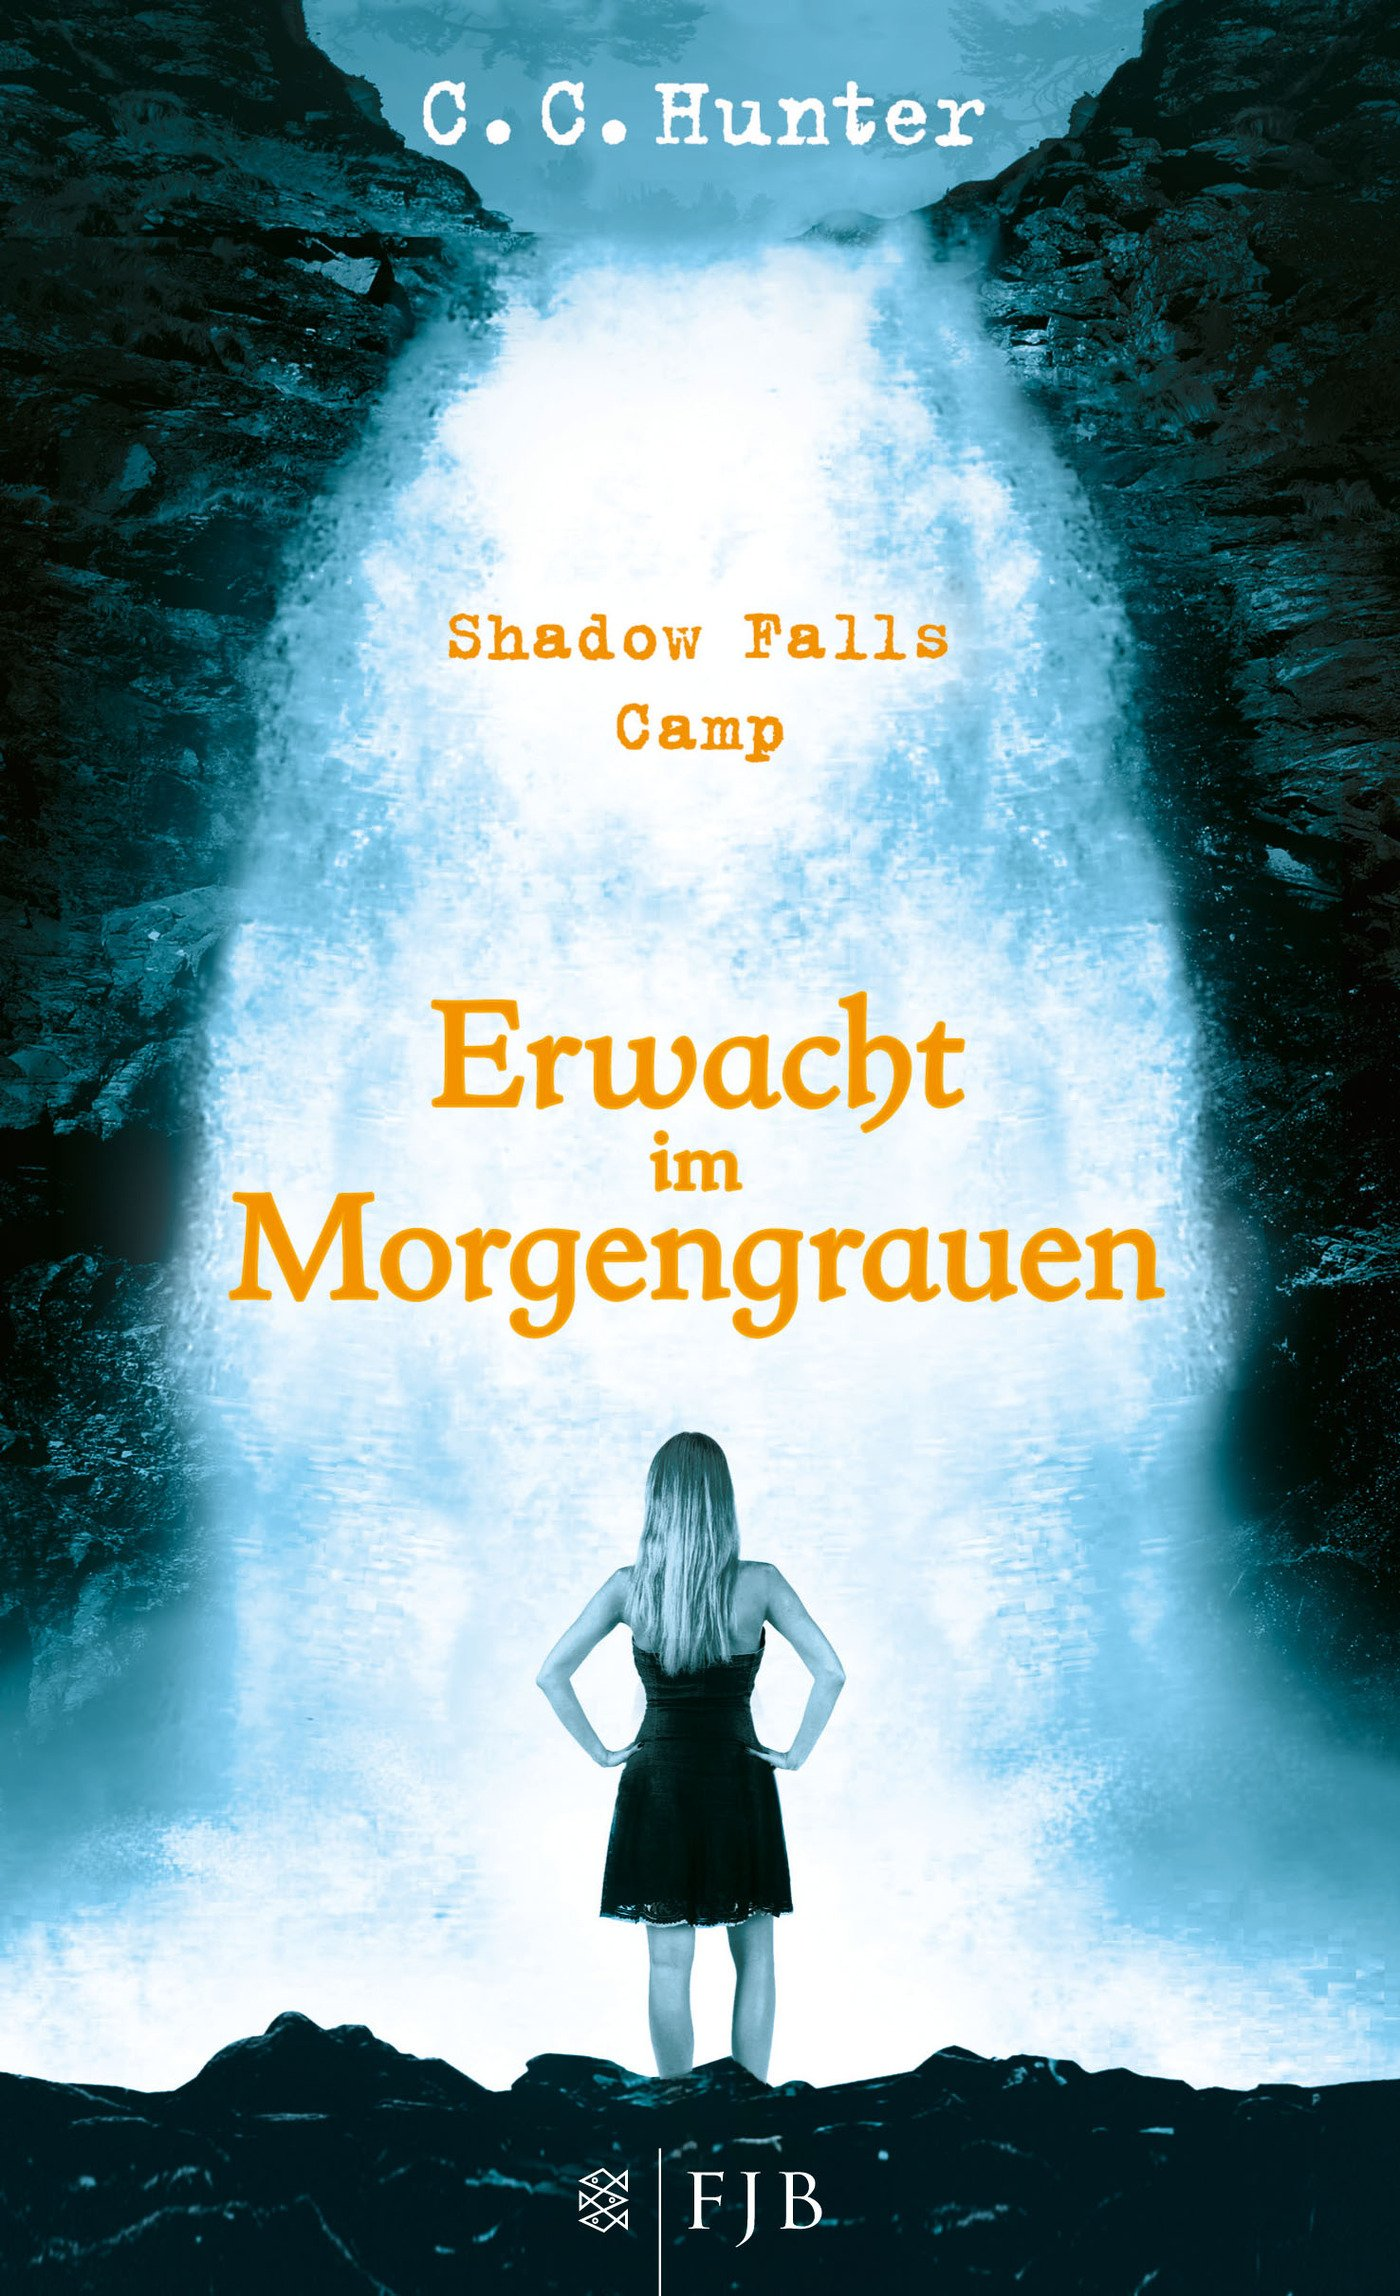 Shadow Falls Camp €� Erwacht Im Morgengrauen: Band 2: Amazon: Cc  Hunter, Tanja Hamer: B�cher